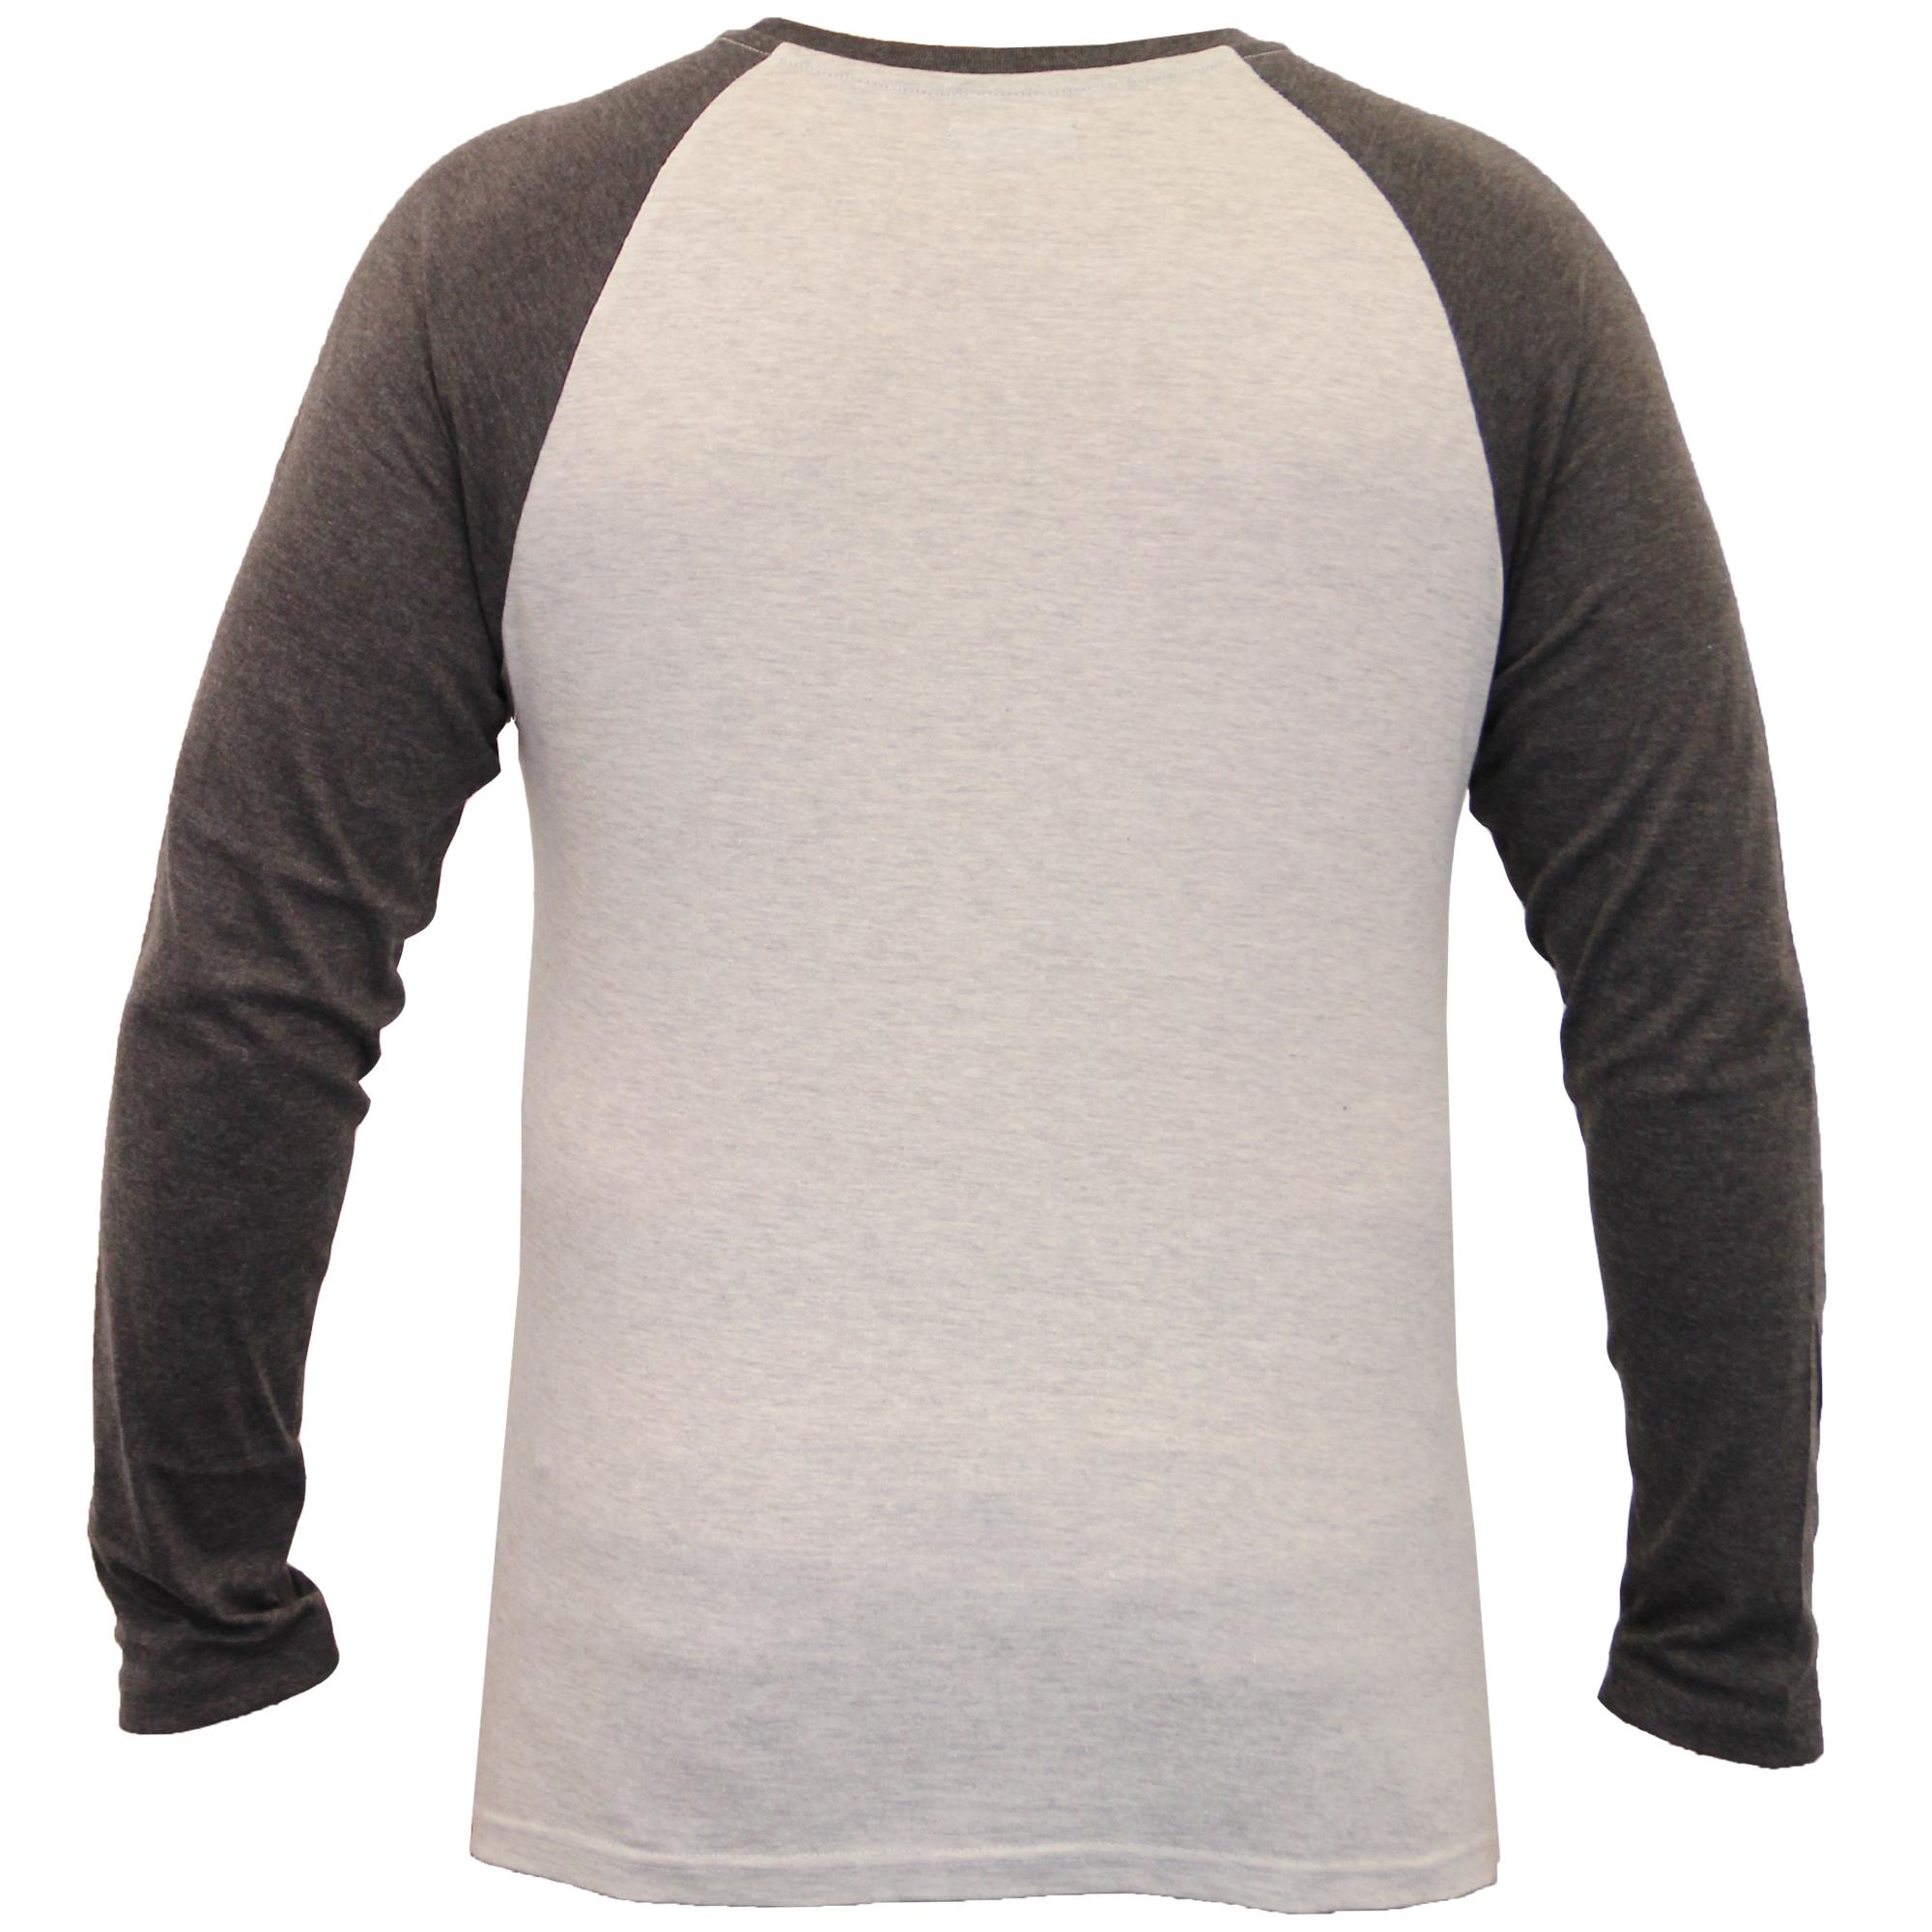 Top-Hombre-Brave-Soul-Manga-Larga-Camiseta-Jersey-Cuello-Redondo-Casual